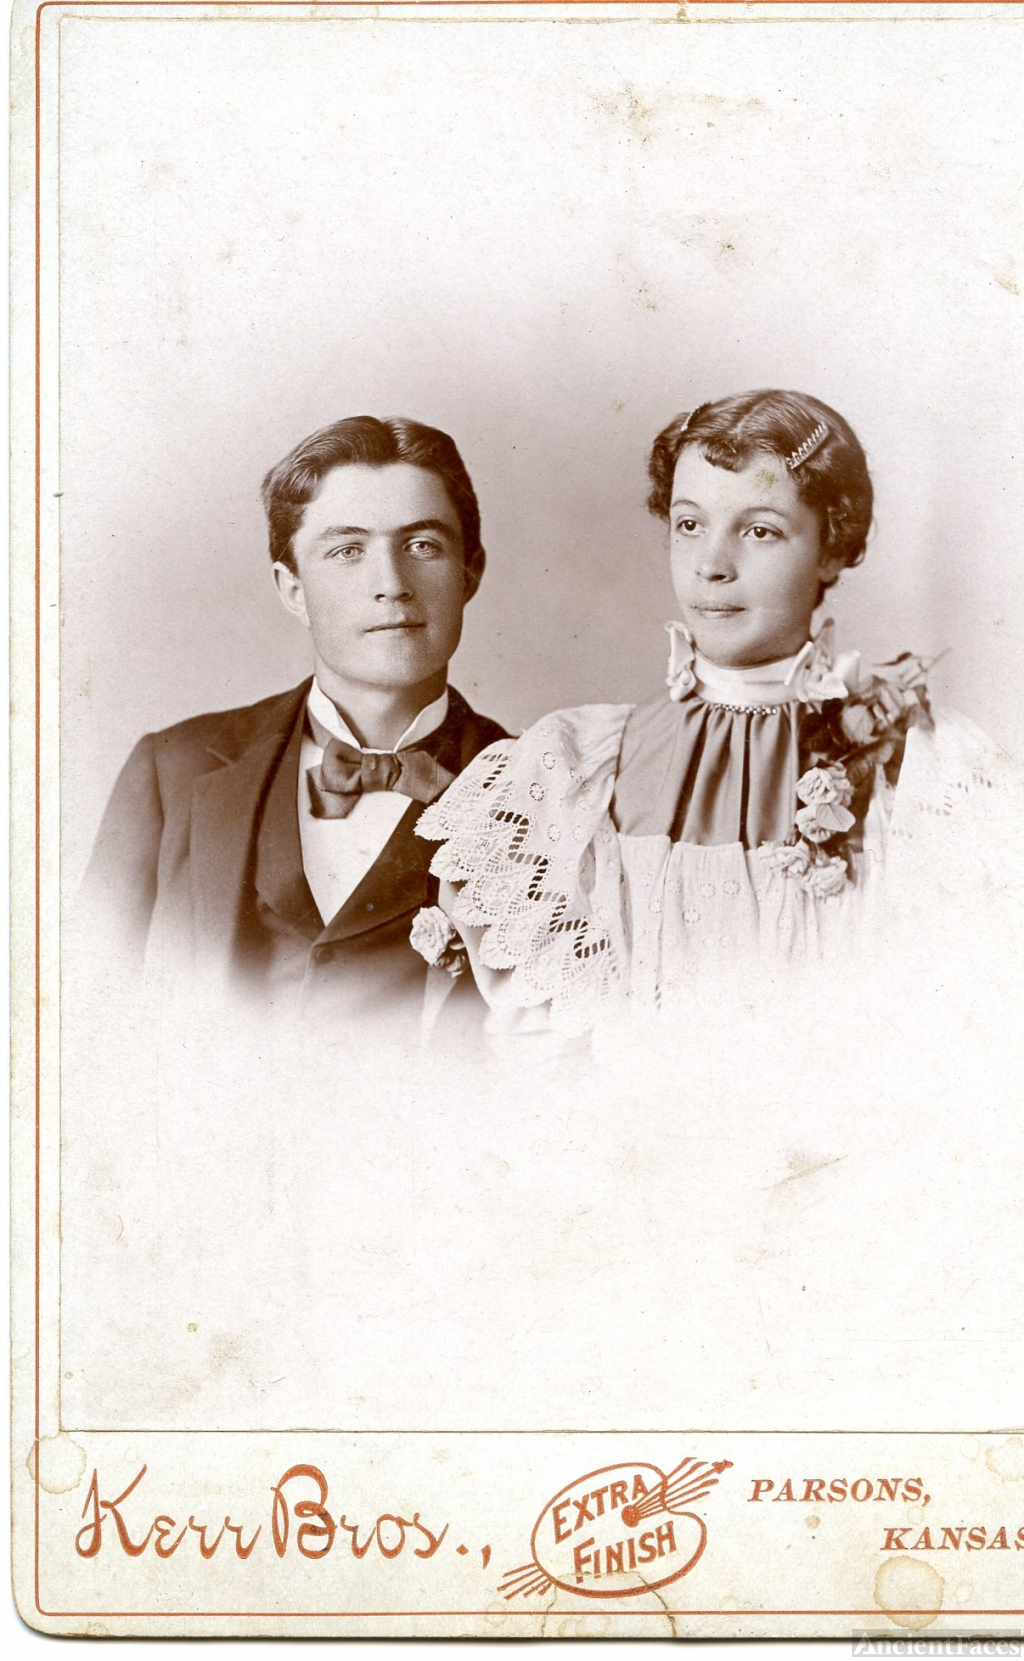 Granville Hacker & Minnie Cameron, Kansas